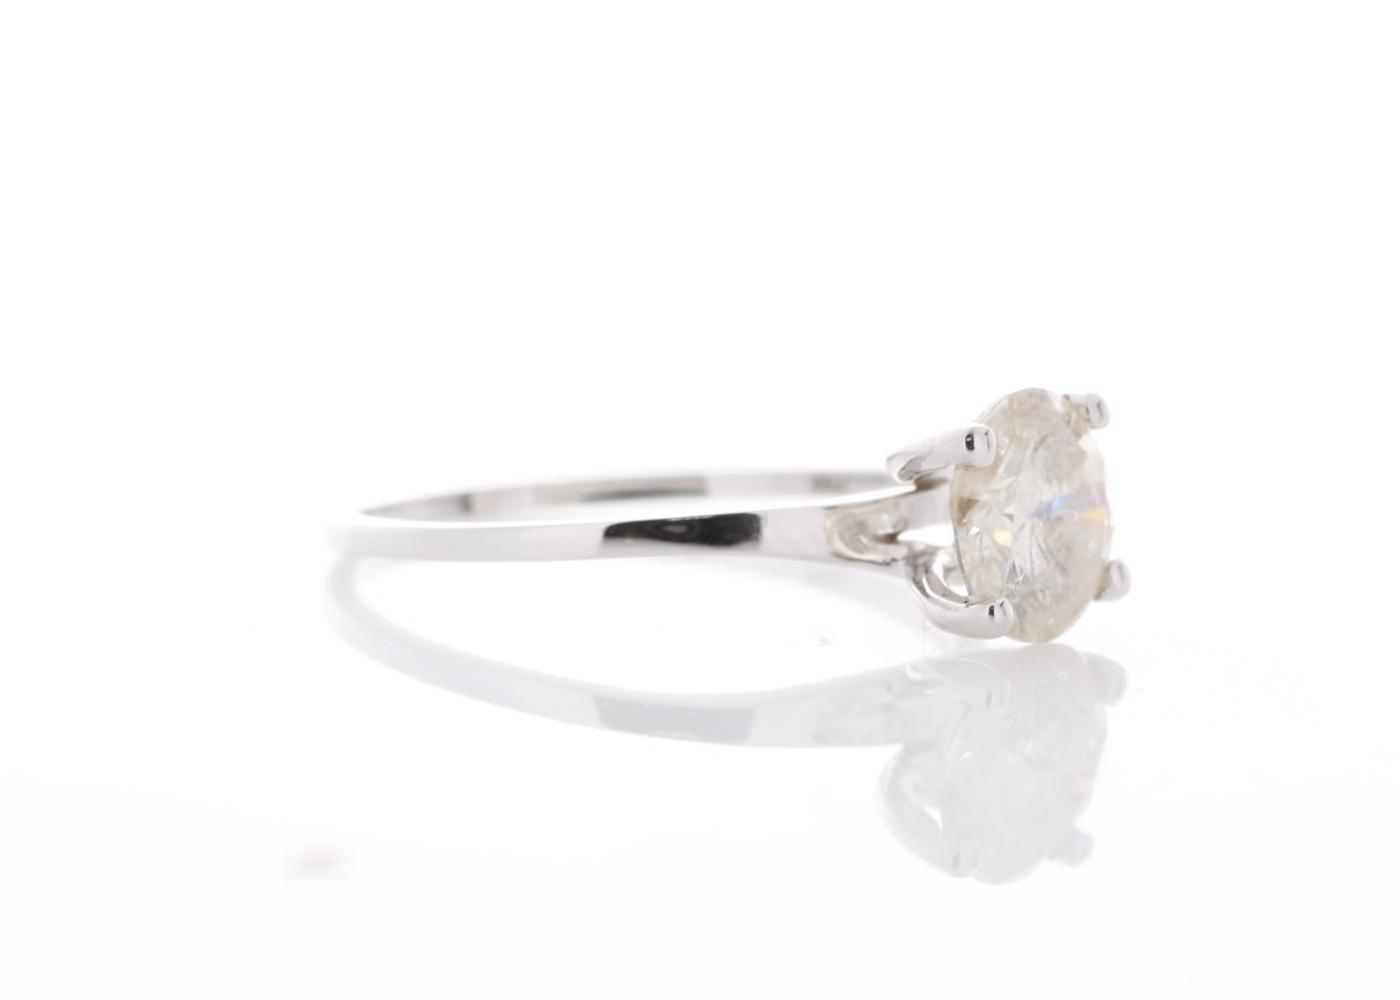 Lot 7 - 18ct White Gold Rex Set Diamond Ring 1.19 Carats